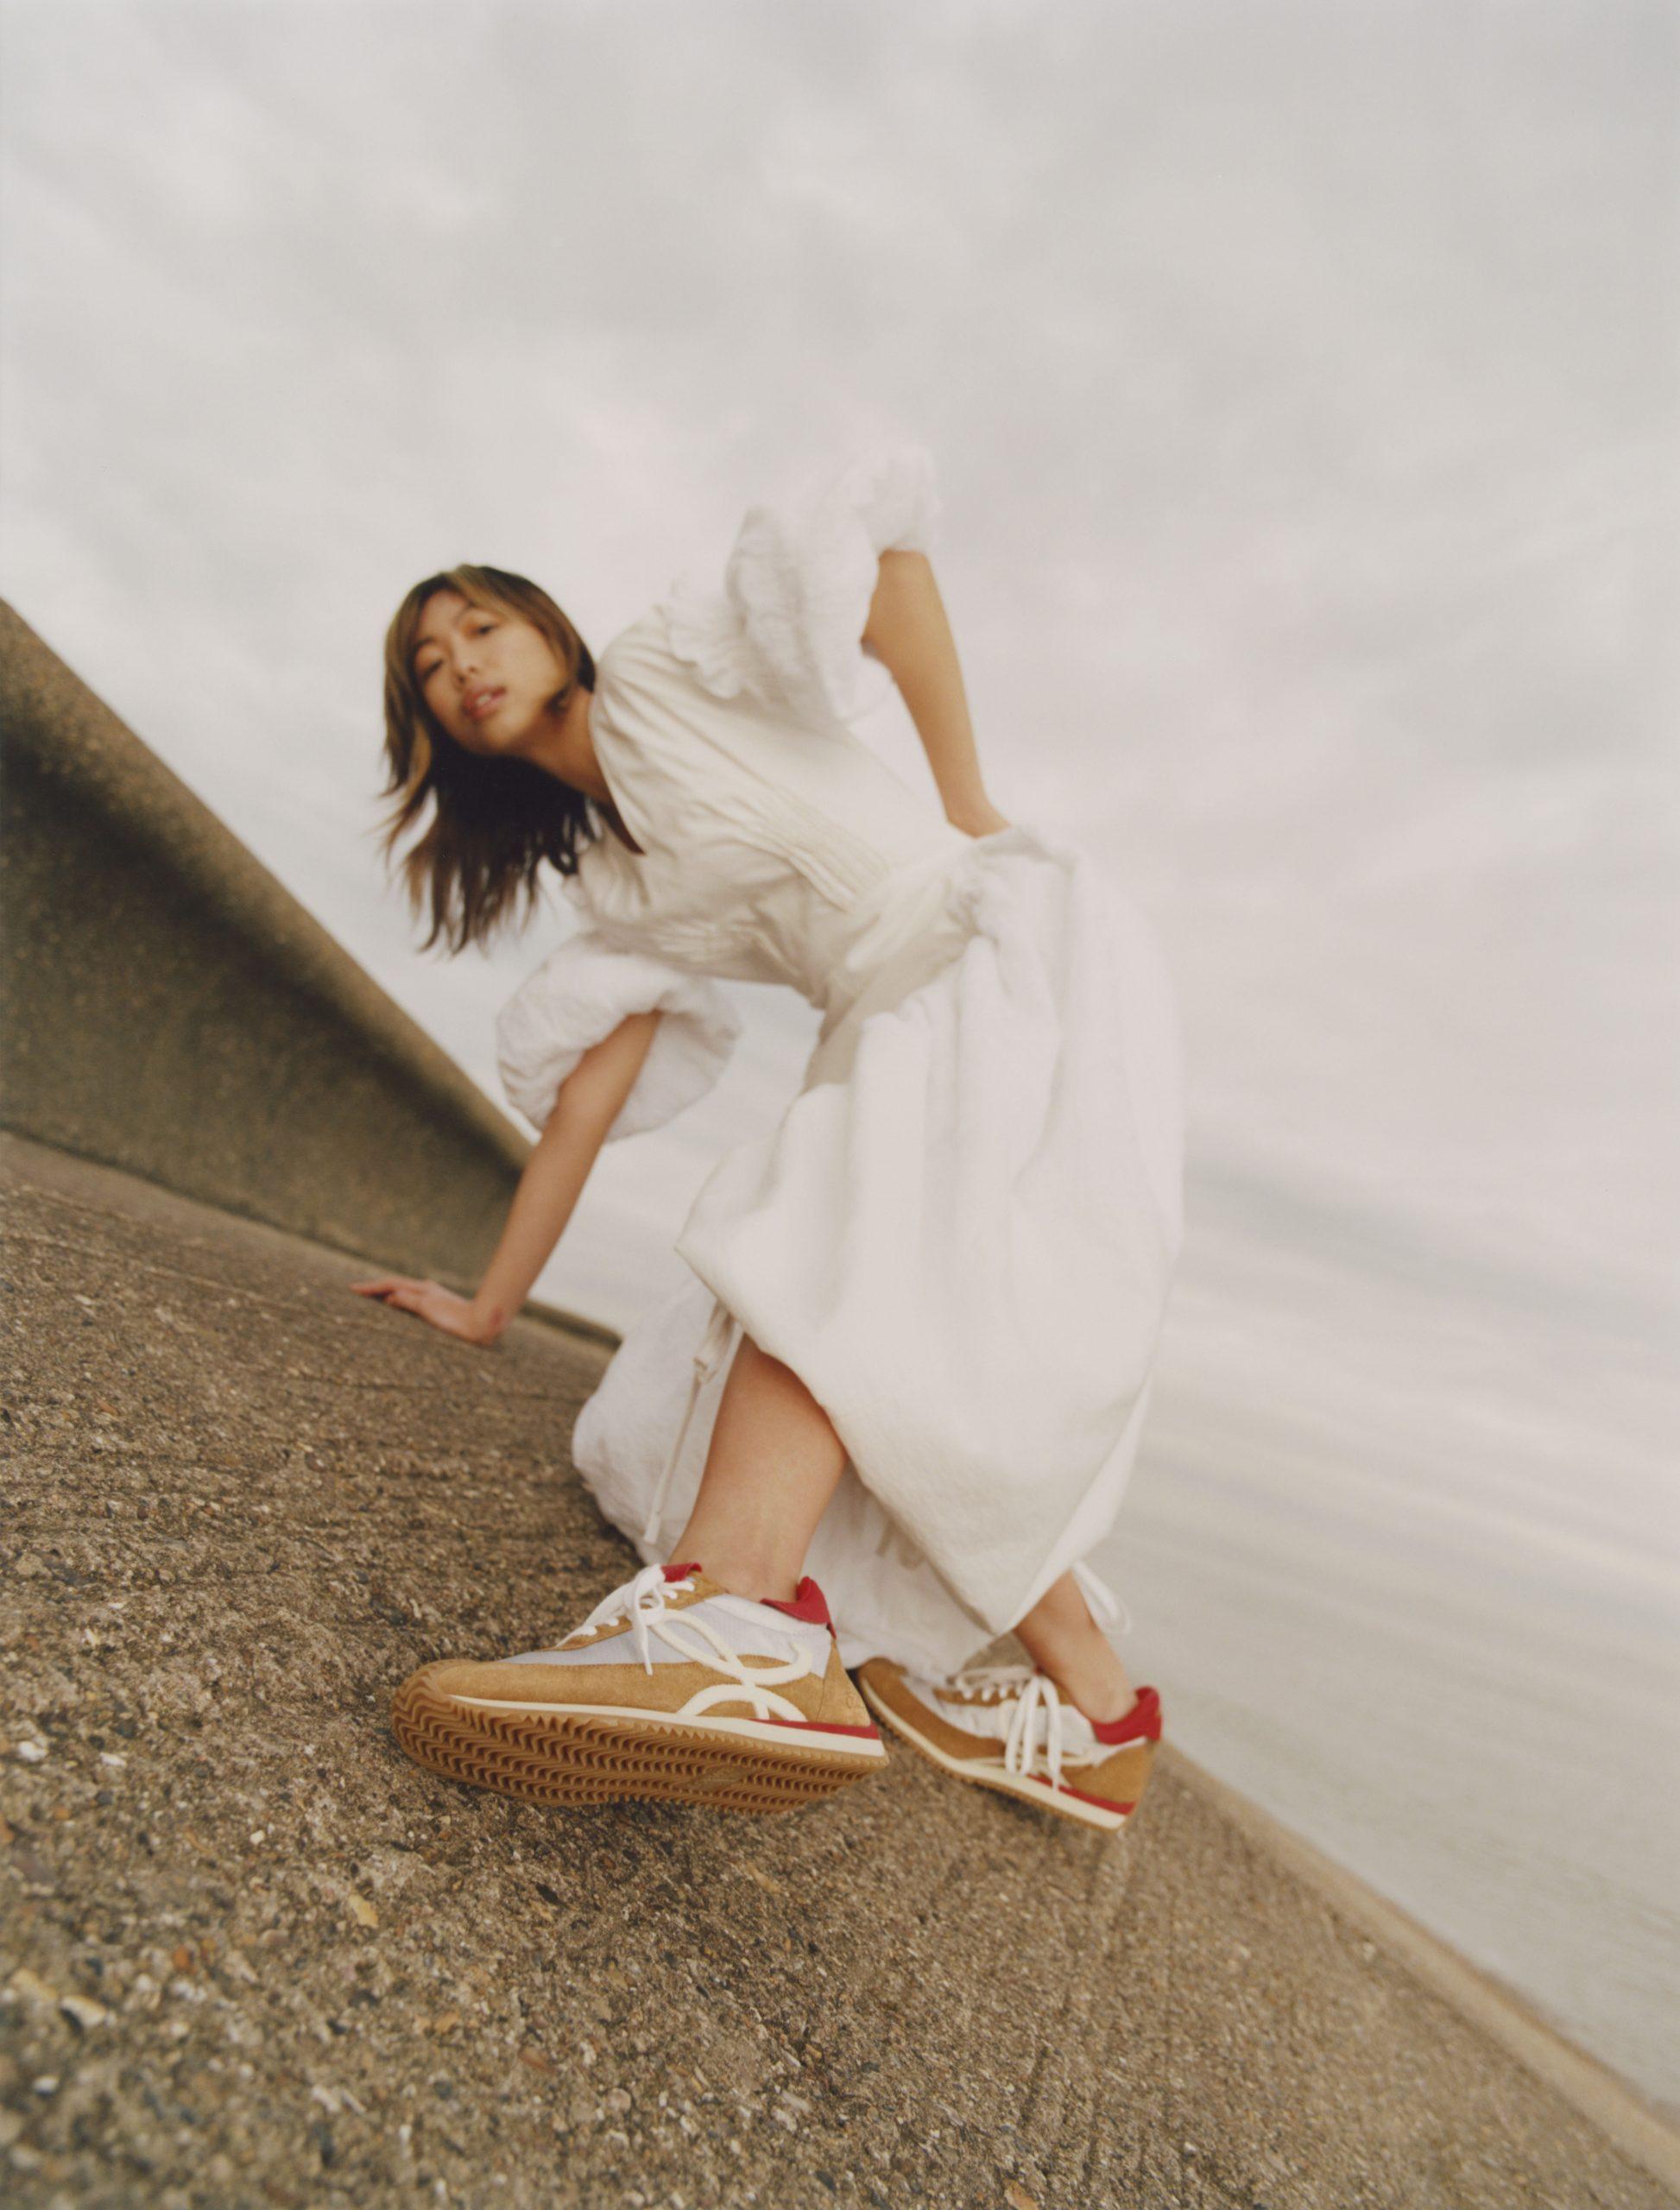 Loewe Introduces The Flow Runner Sneaker For Spring 2021